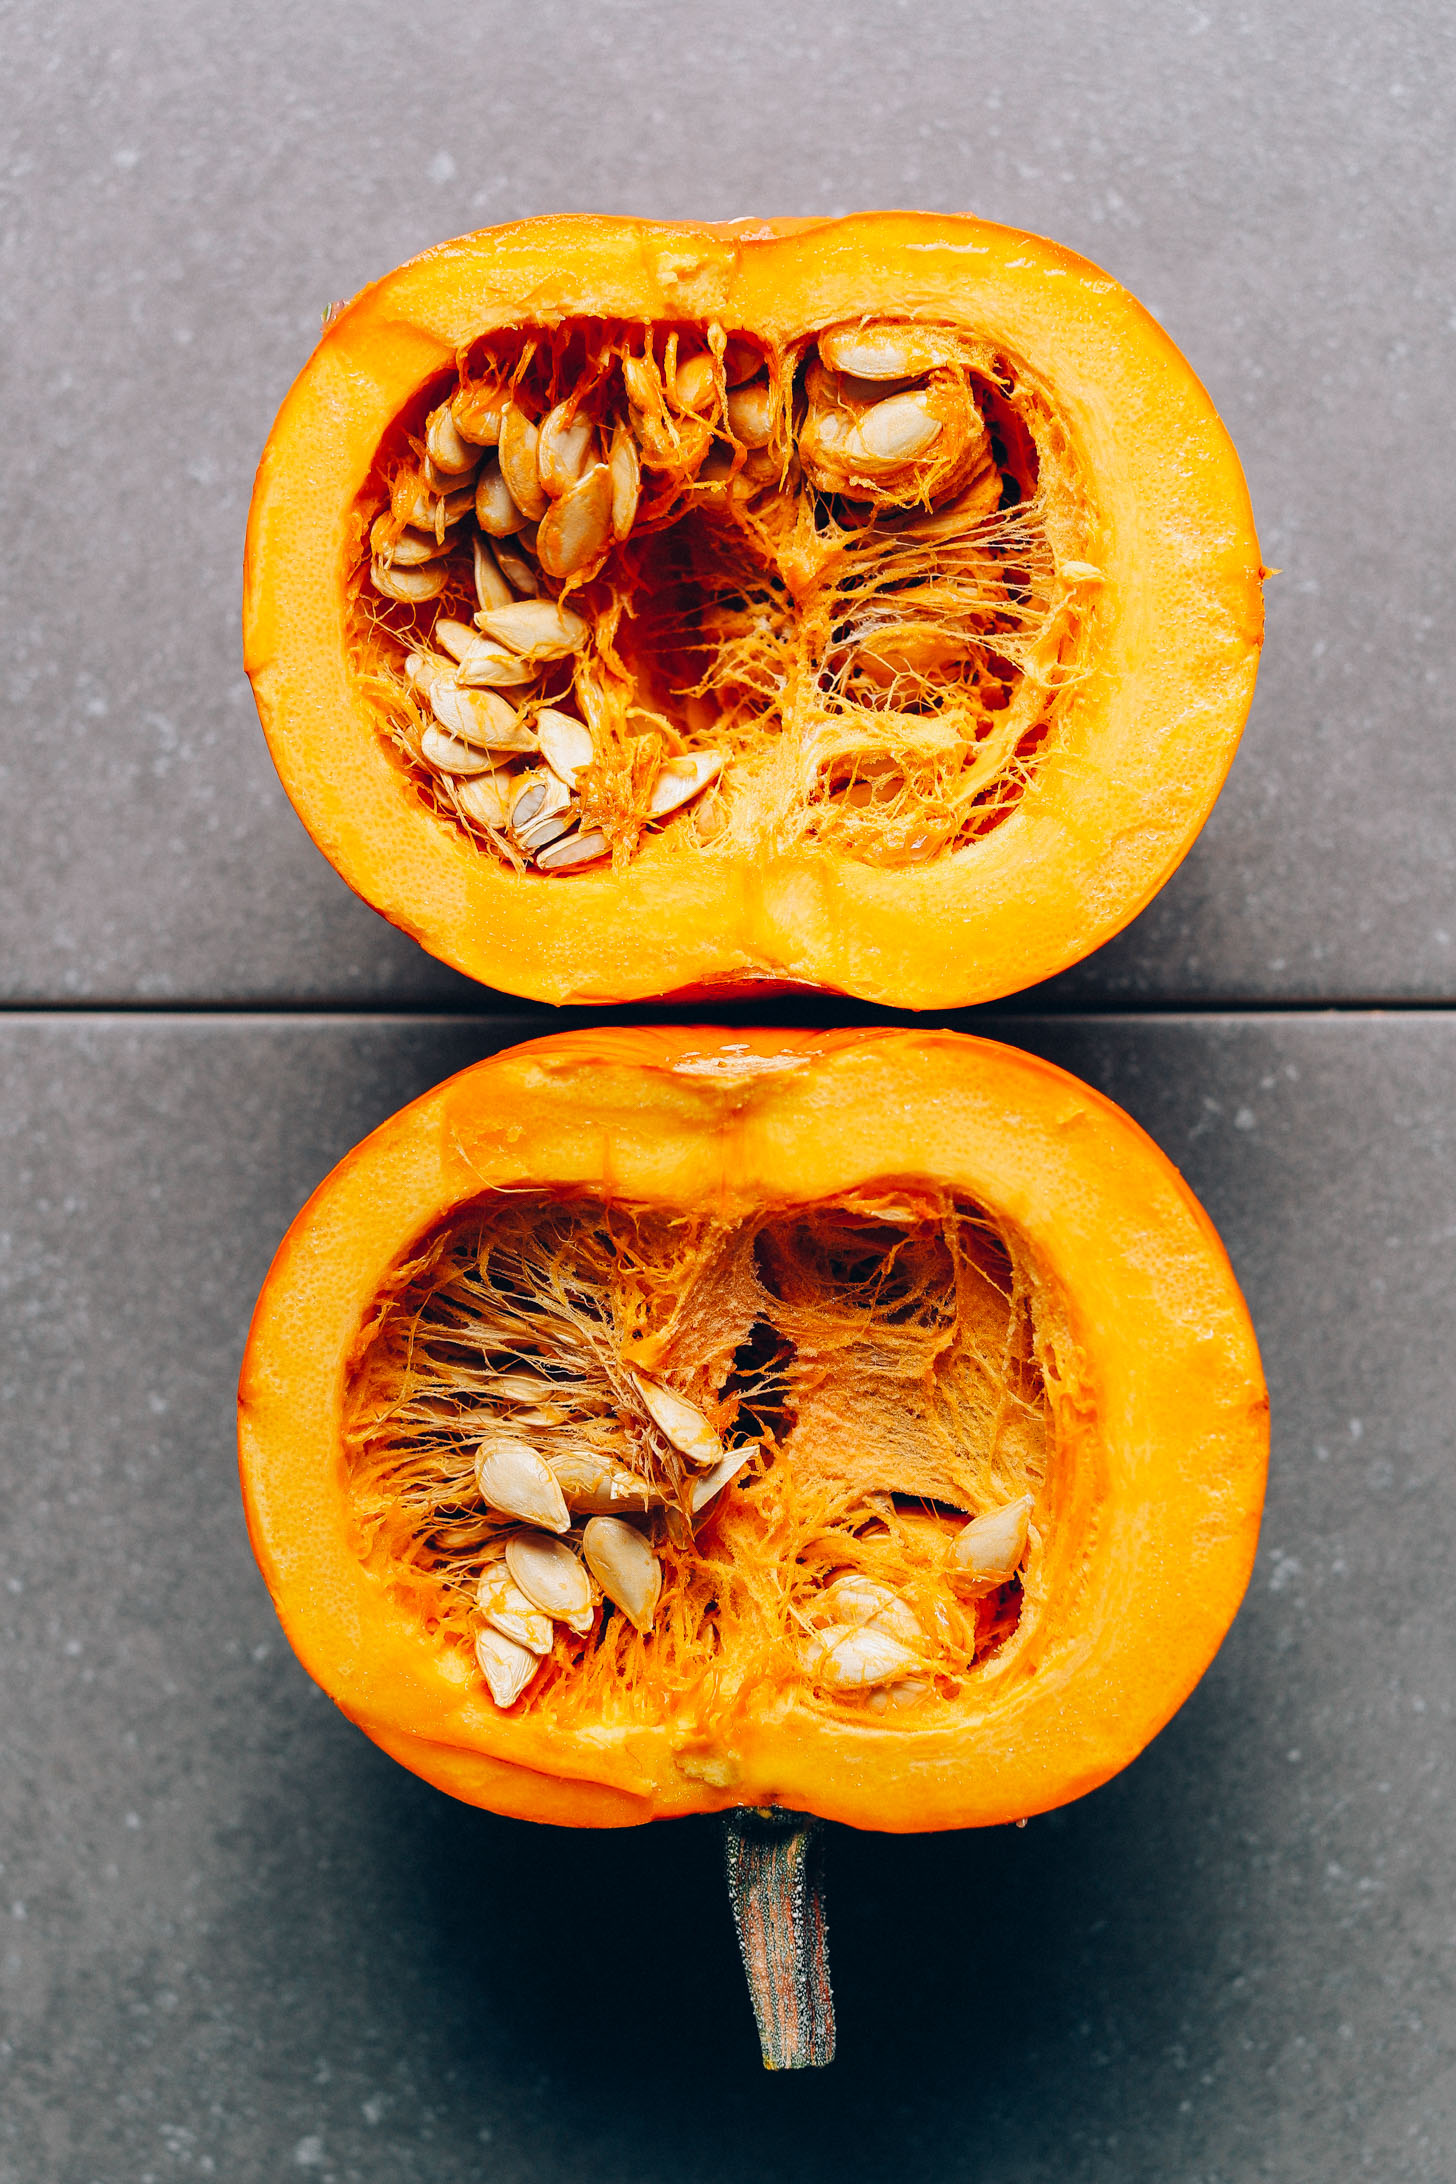 Halved pumpkin for our How to Roast Pumpkin tutorial